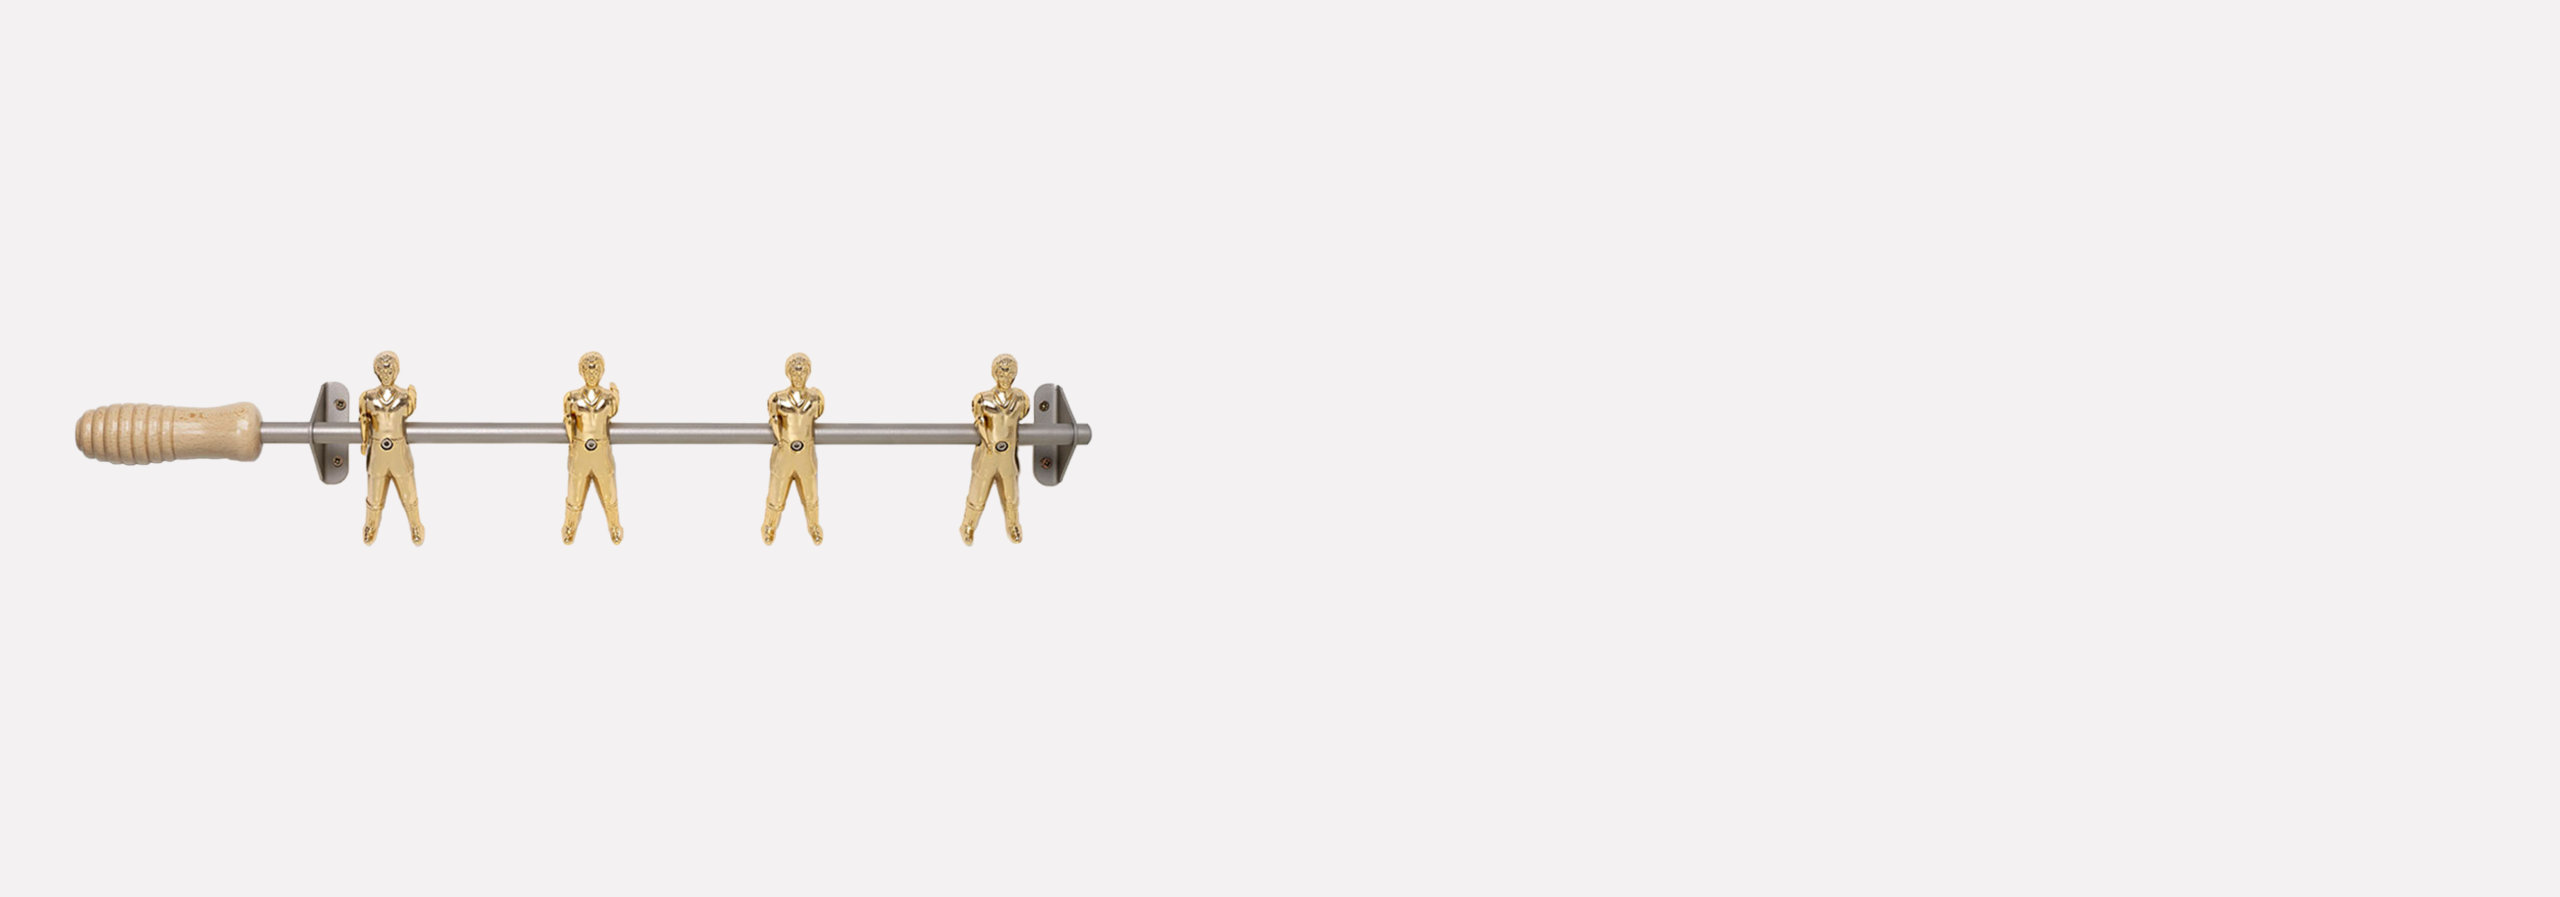 WALL_CHAMPIONS_SLIDE_01